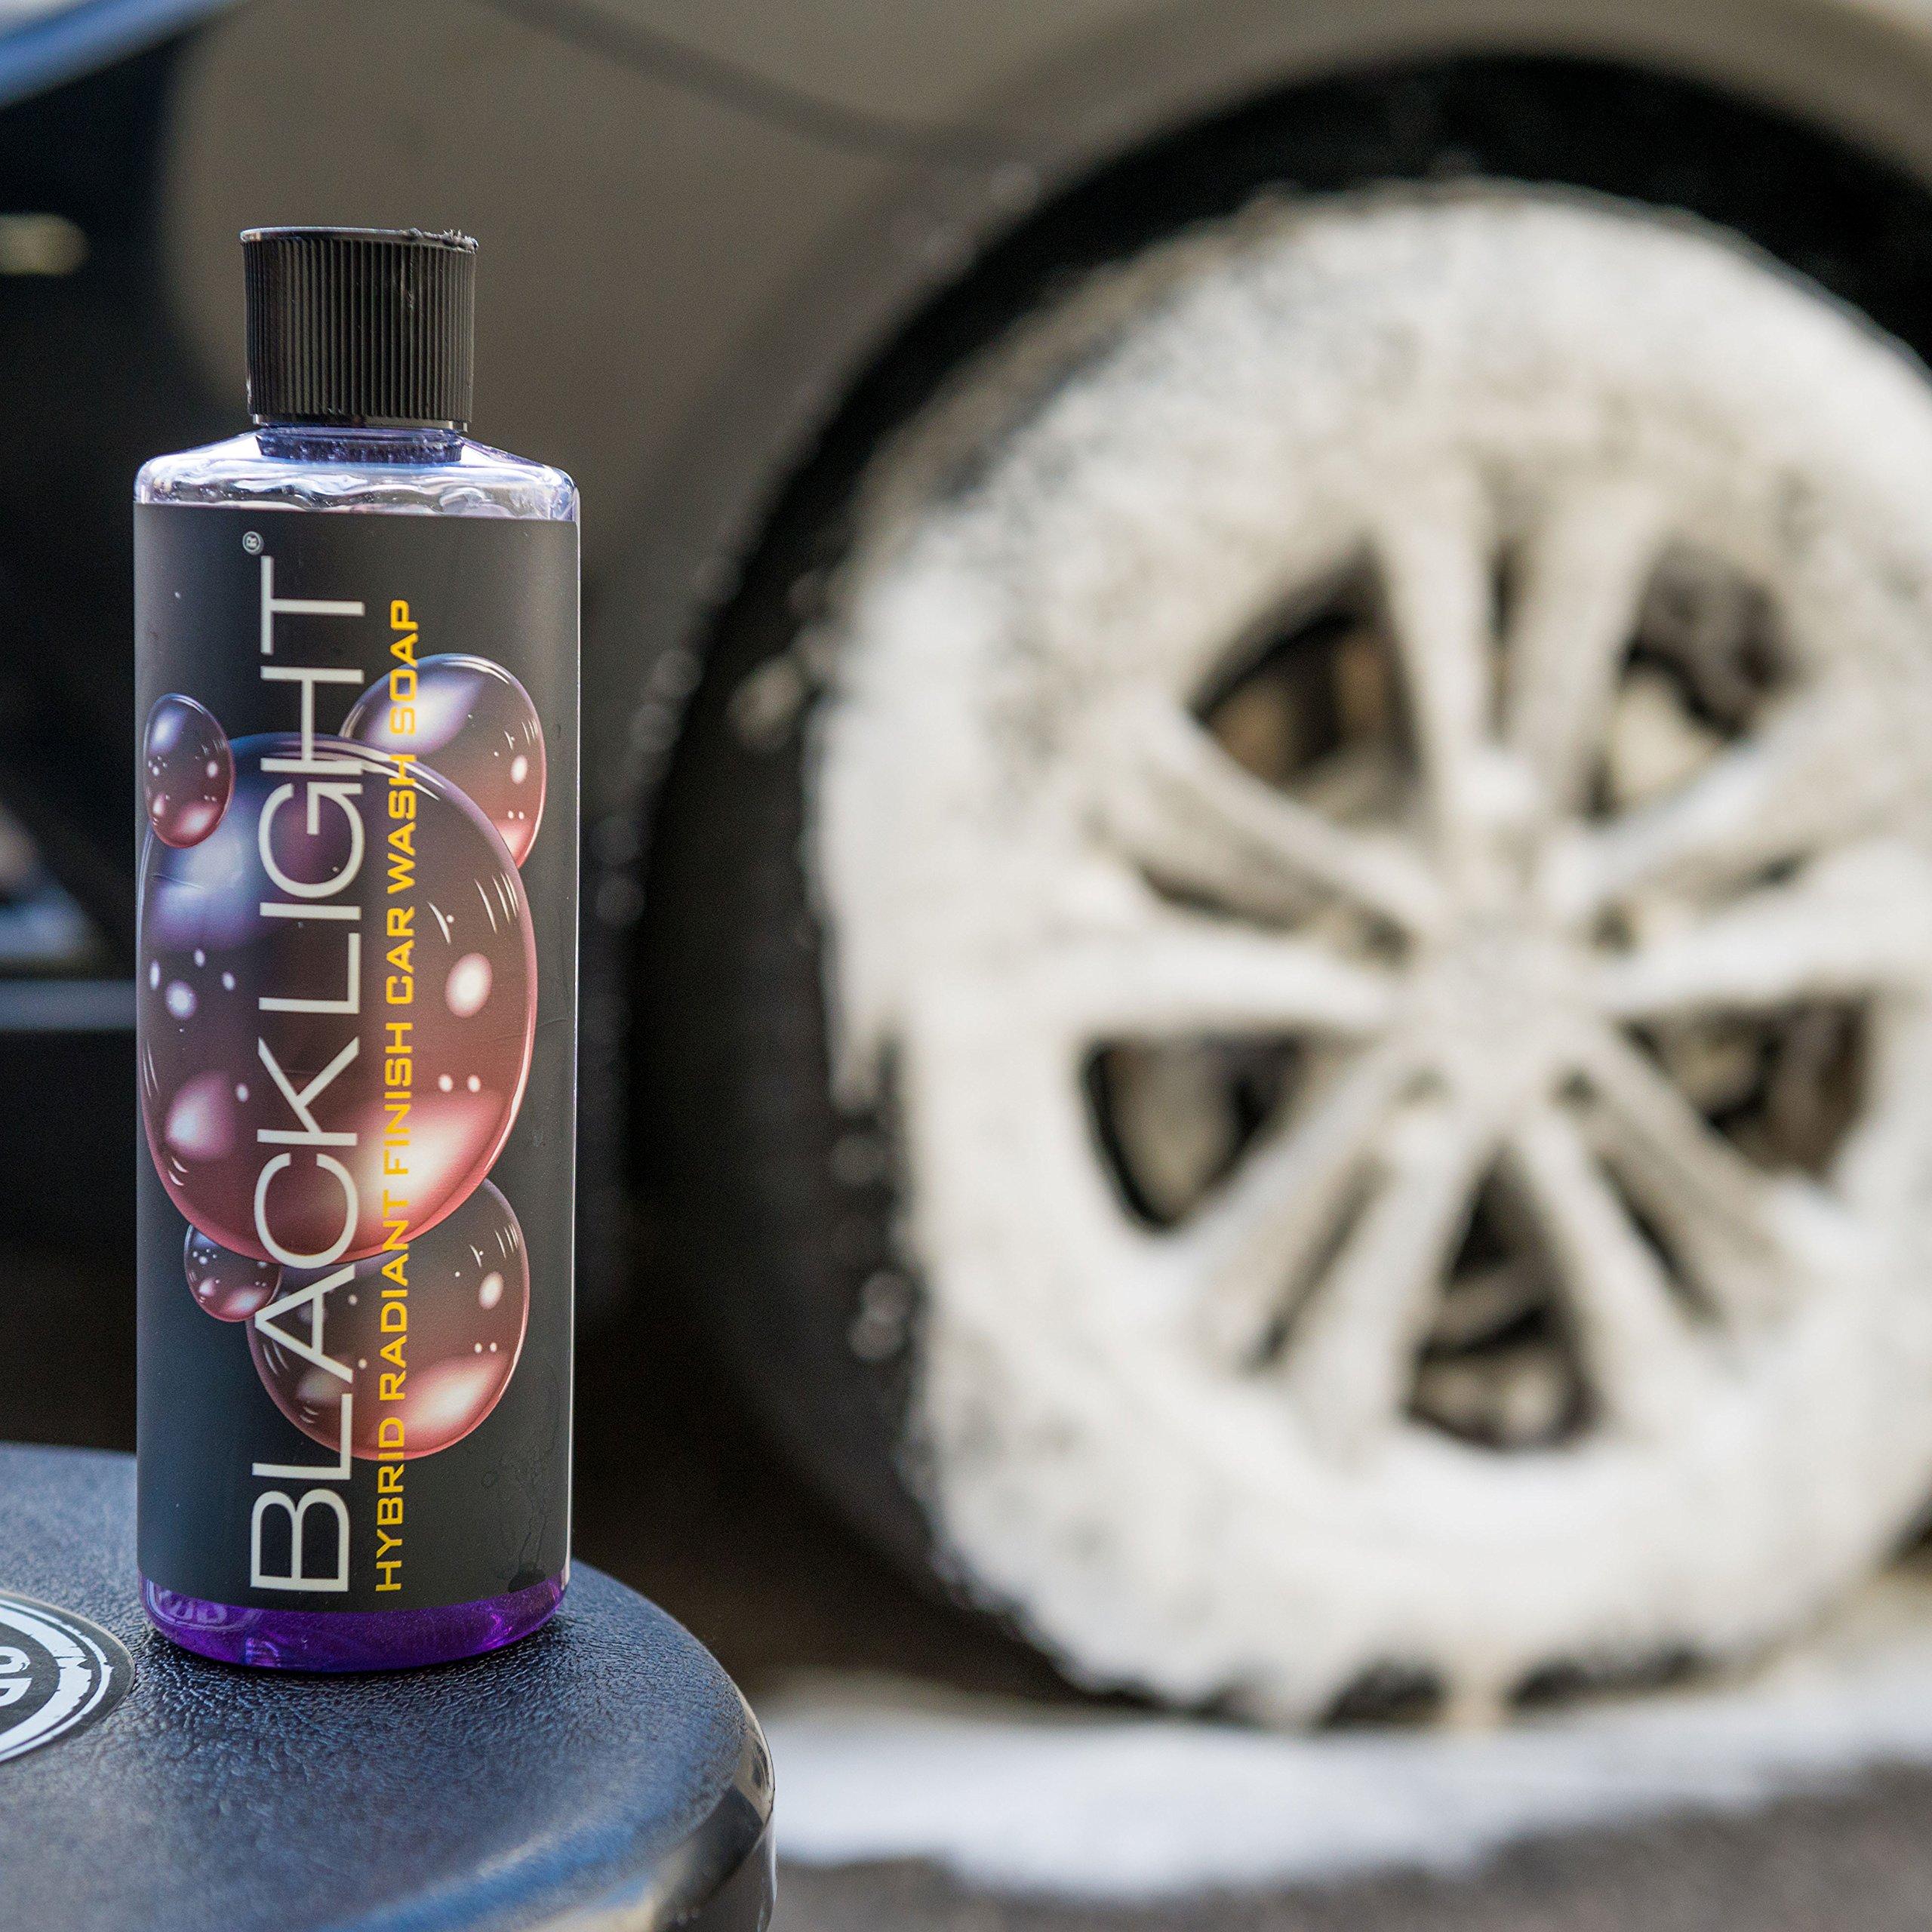 Chemical Guys CWS61964 Black Light Hybrid Radiant Finish Car Wash Soap (64 oz - 1/2 Gallon) by Chemical Guys (Image #2)